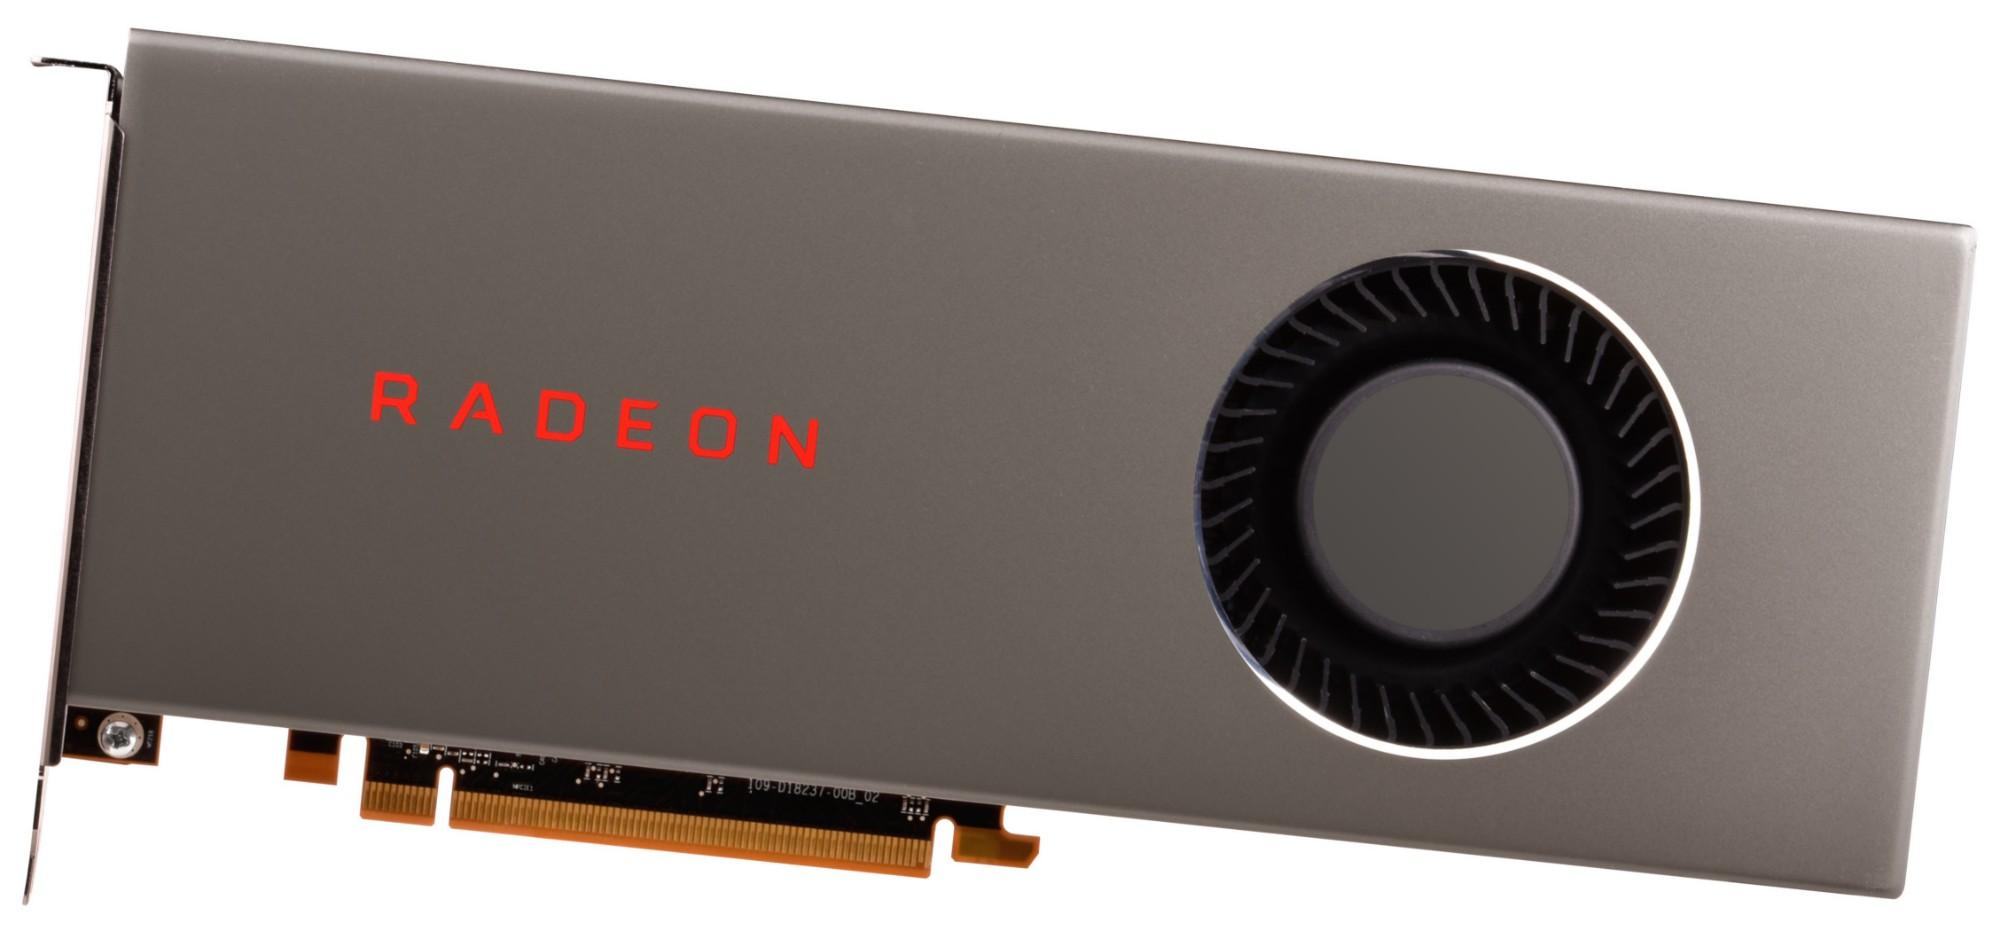 Sapphire Radeon RX 5700 8G GDDR6 8 GB